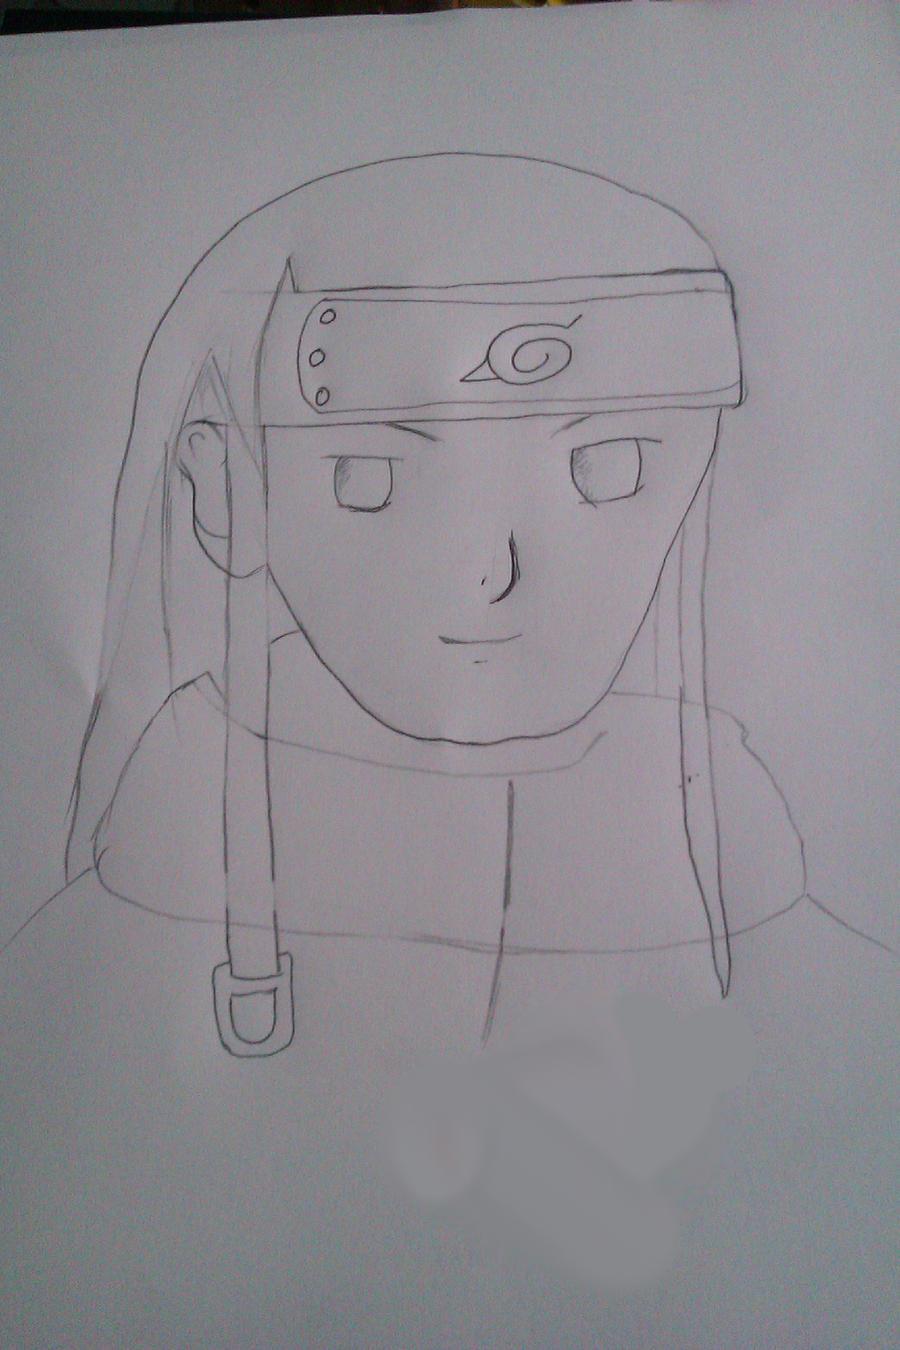 Neji from Naruto Neji_hyuuga__naruto__by_wildinthestreets-d528f1i